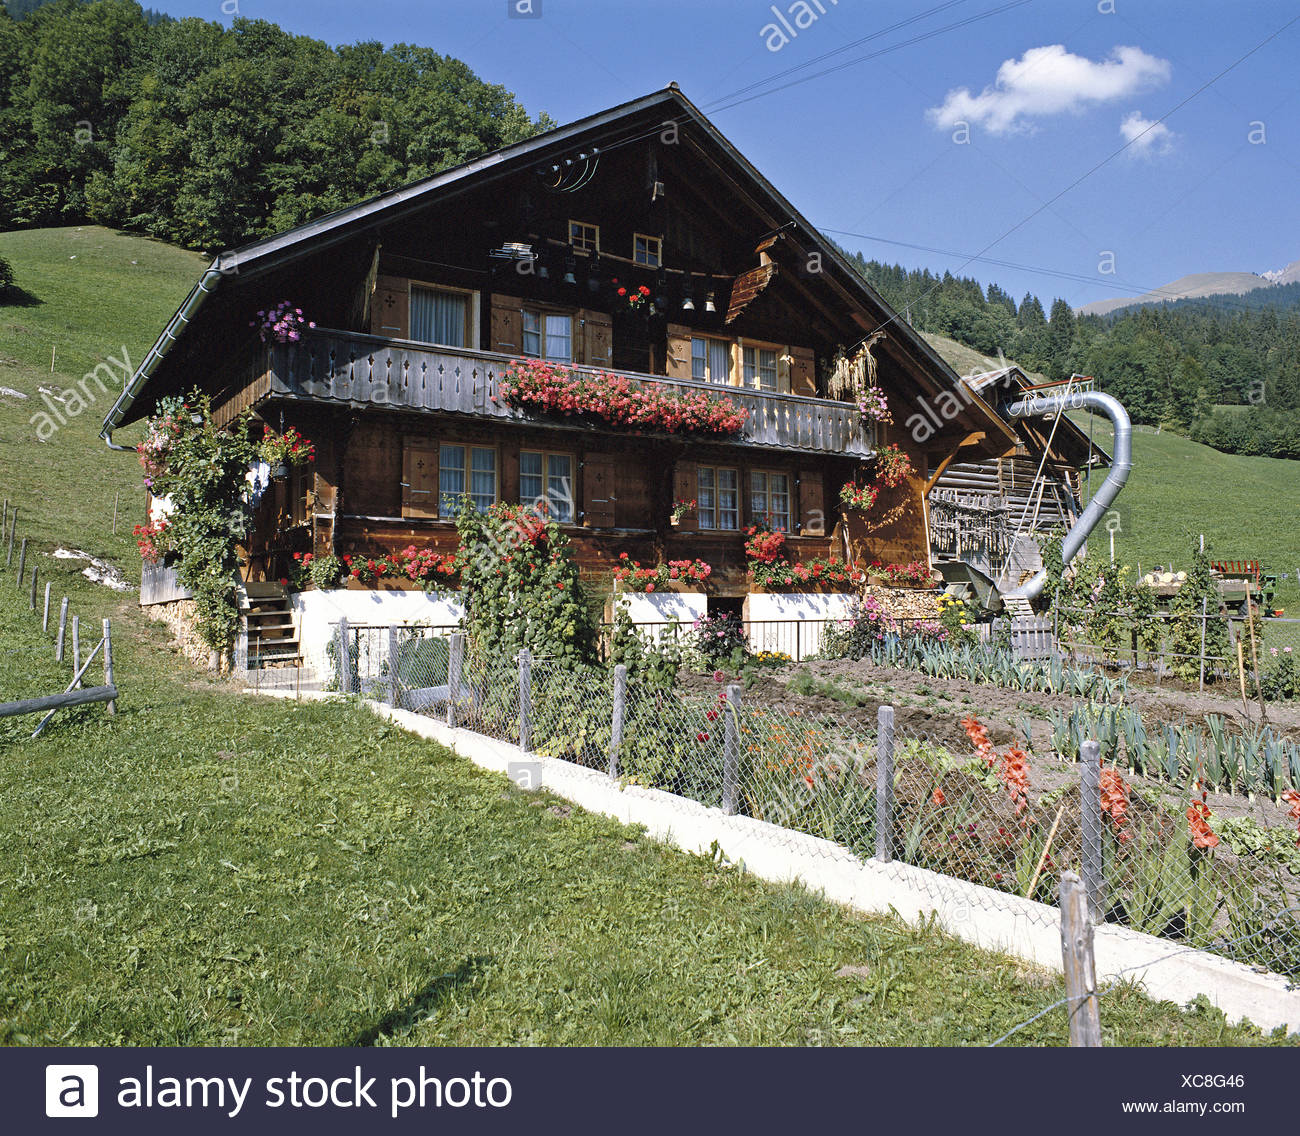 Folklore agriturismo montagna agriturismi giardino di fiori in Svizzera Europa Immagini Stock